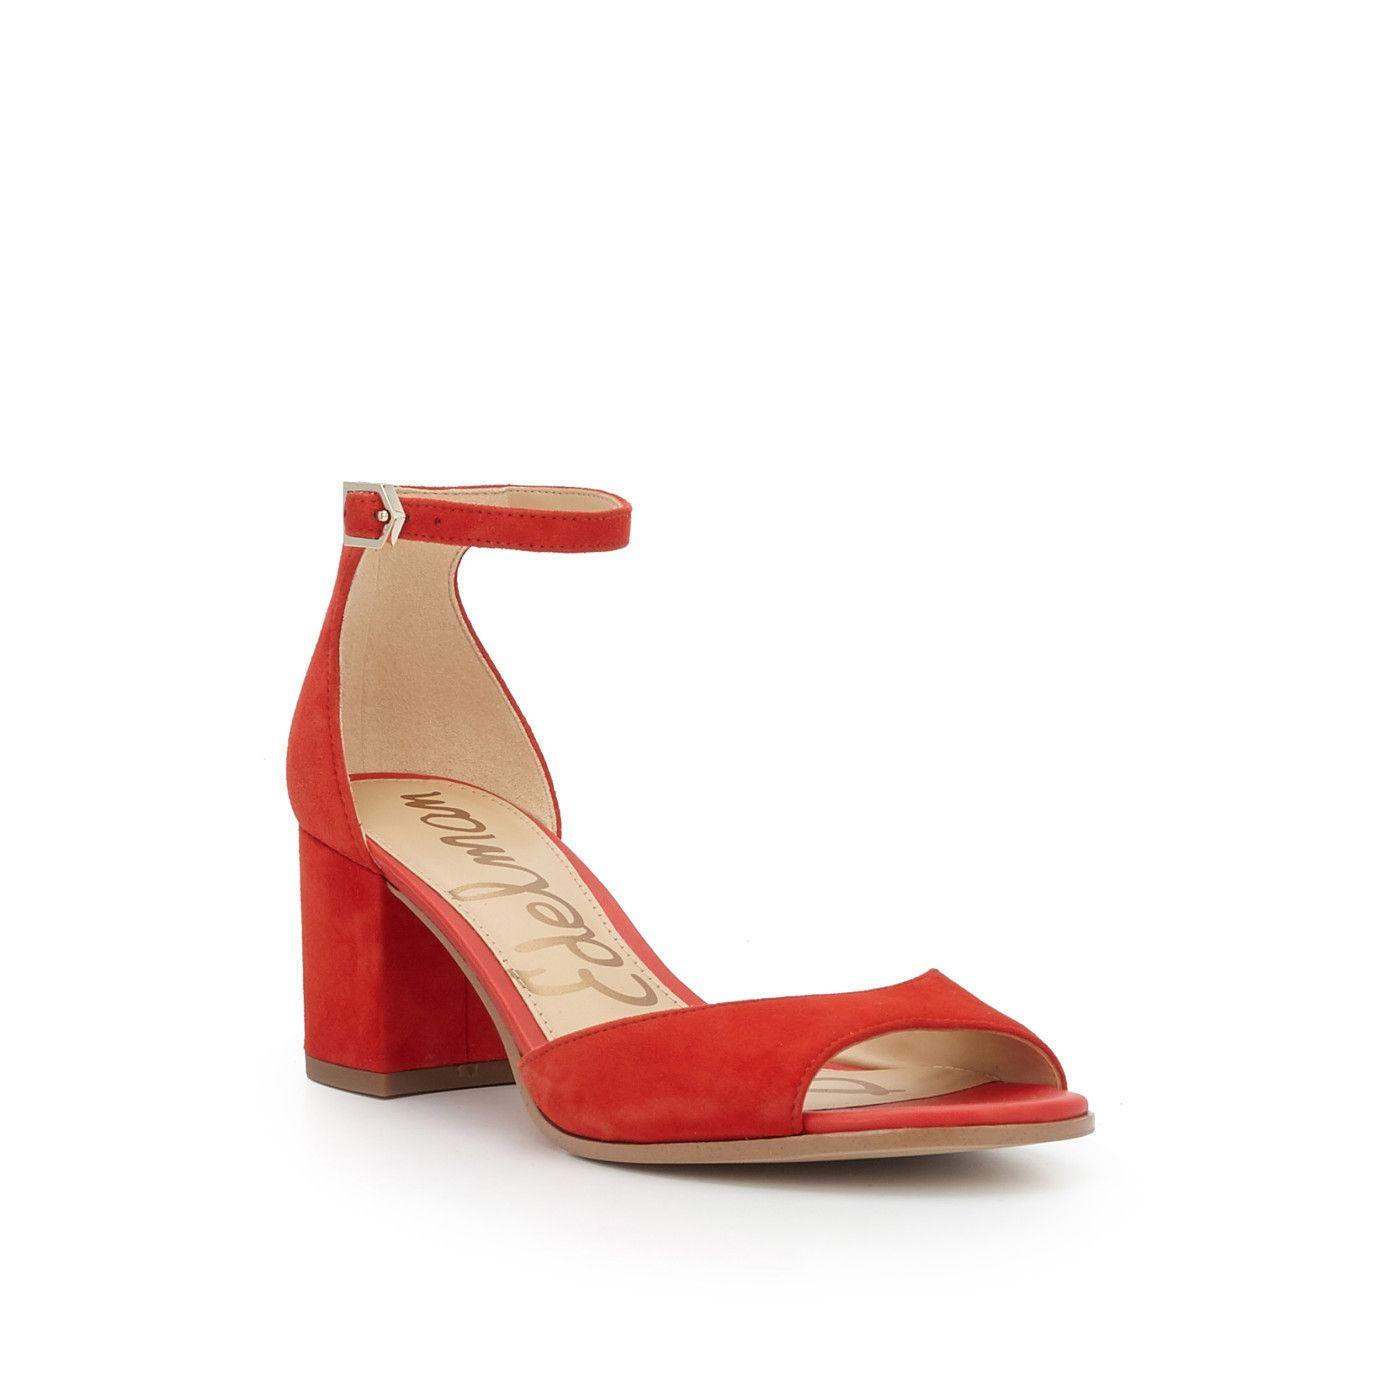 98b221a0772ef8 Susie Ankle Strap Sandal by Sam Edelman - Blood Orange Suede - View ...